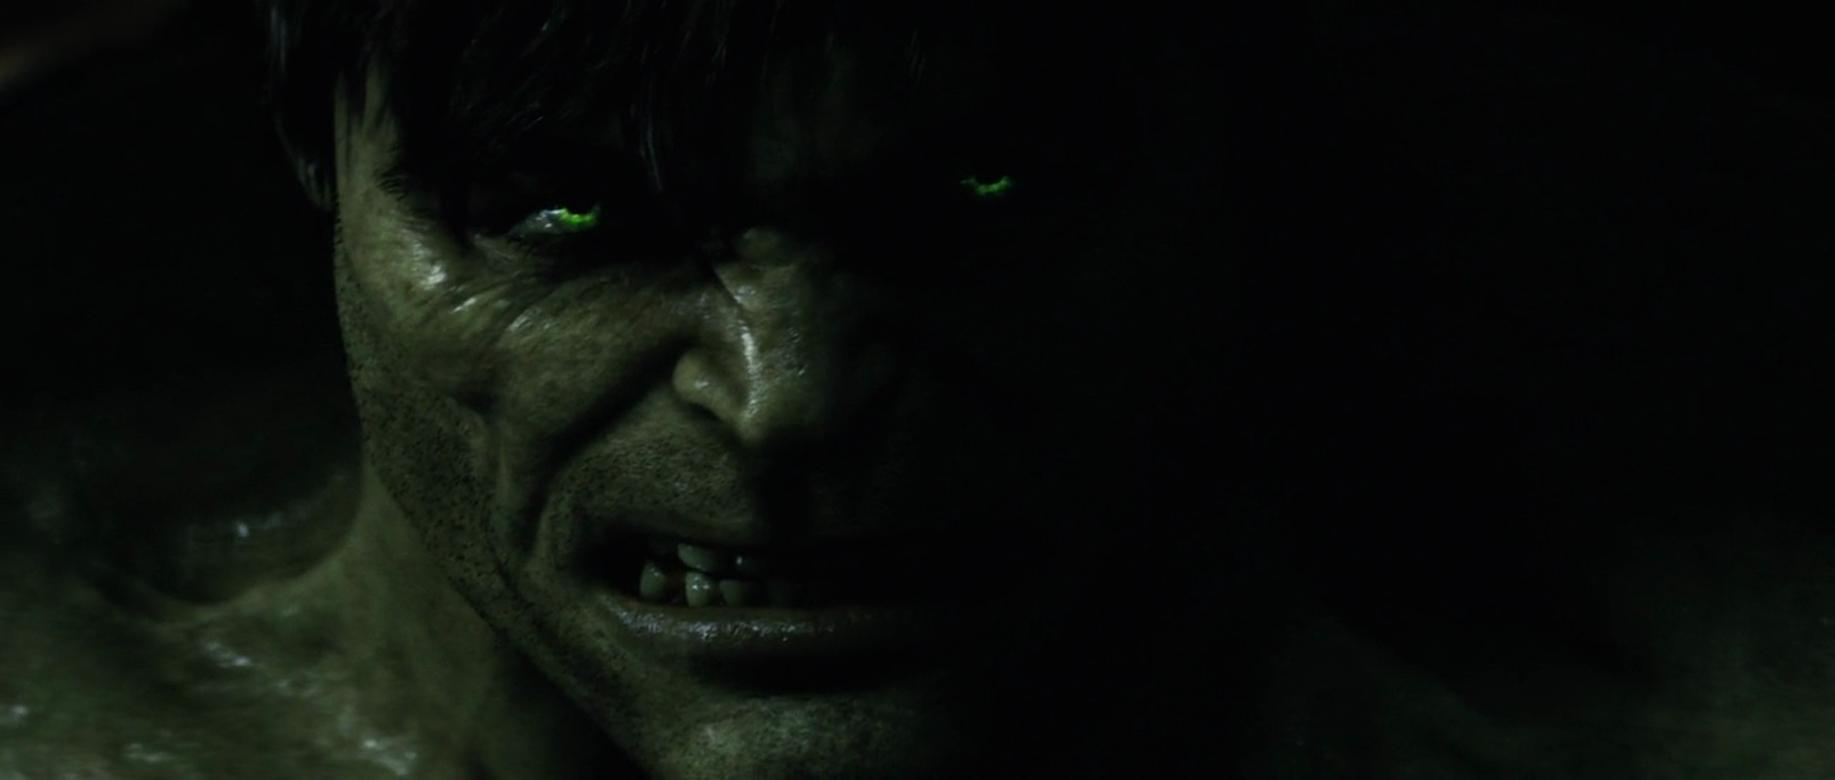 Movie - The Incredible Hulk  Hulk Wallpaper